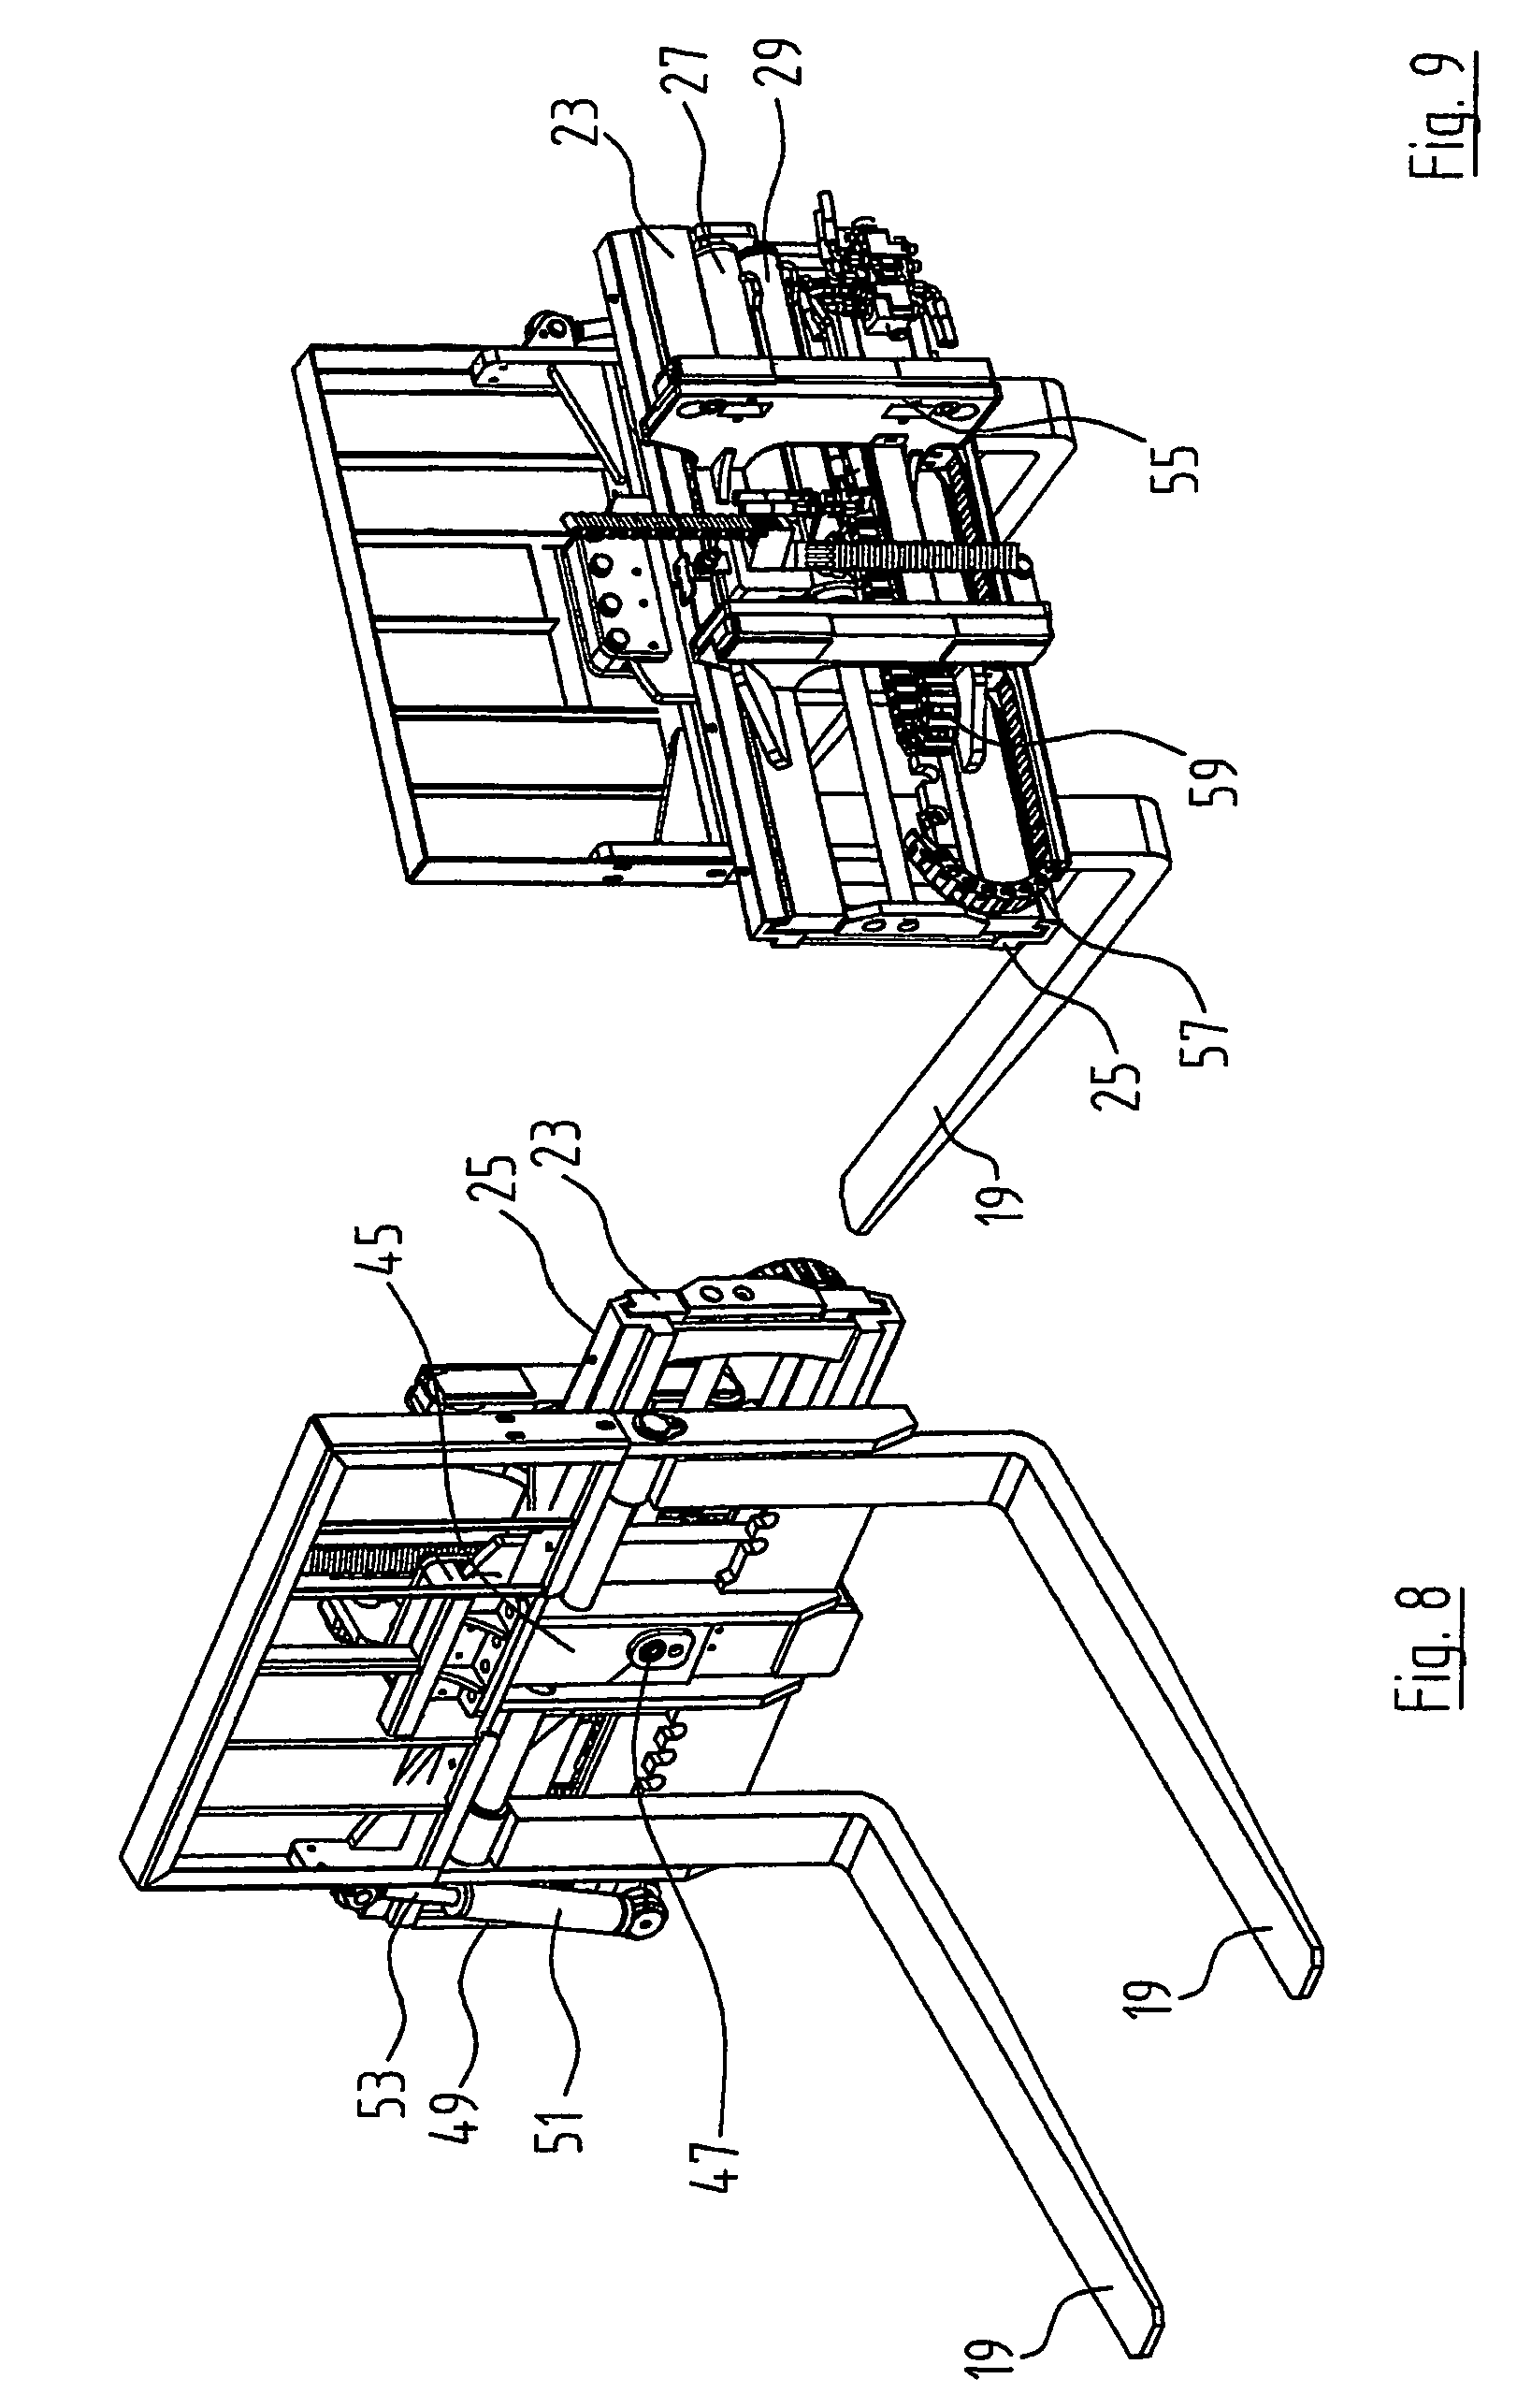 Caterpillar Forklift Ignition Wiring Diagram